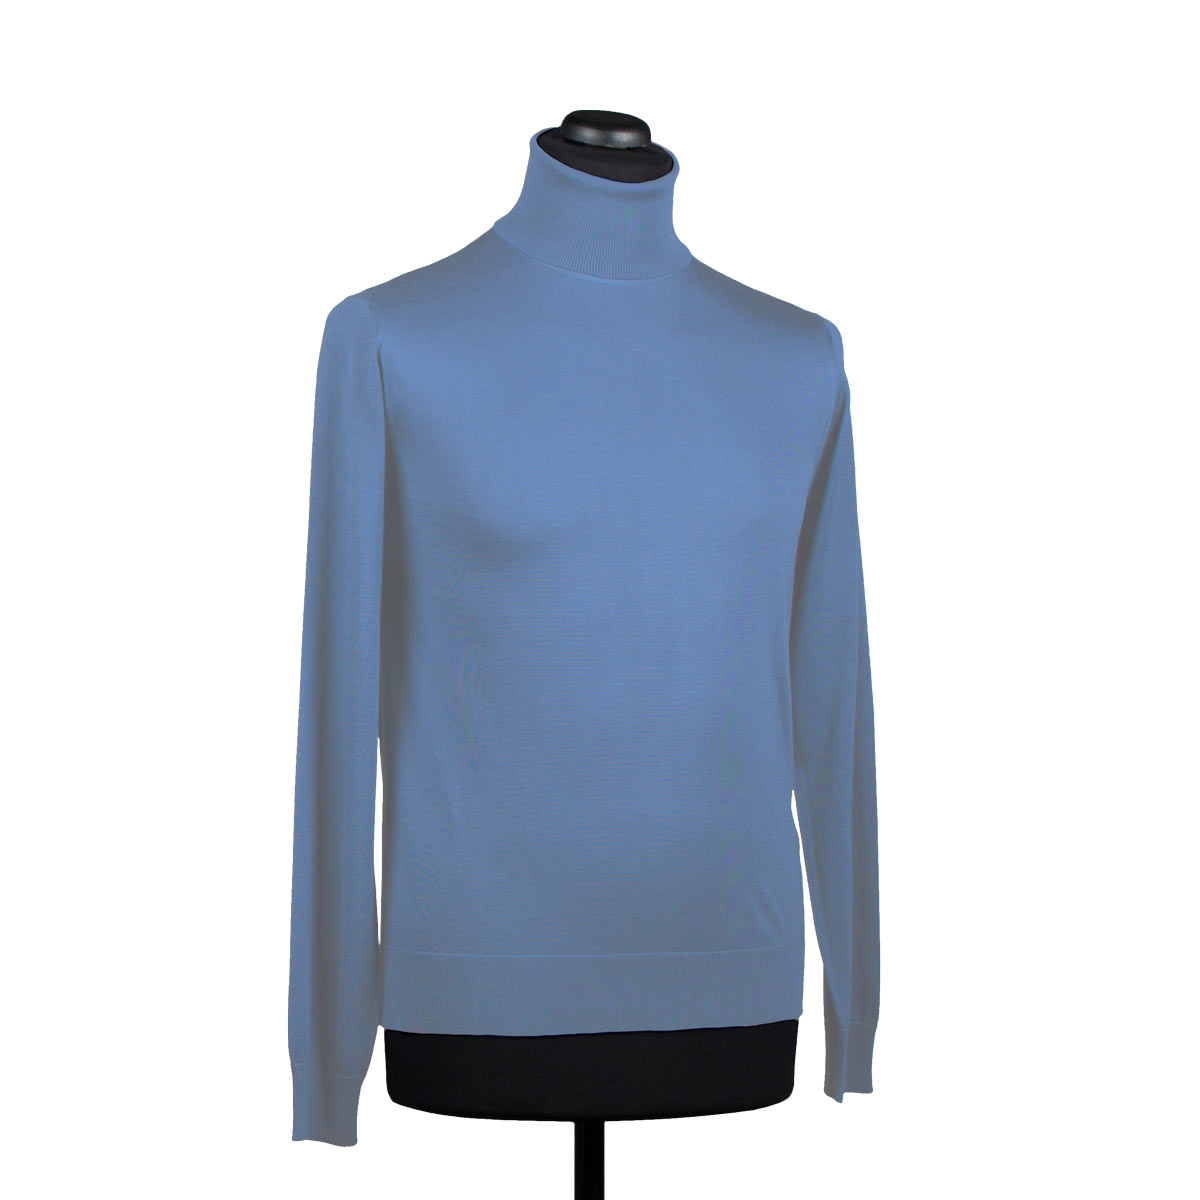 Silk turtleneck sweater for men, light blue - DiFranco Moda Italiana